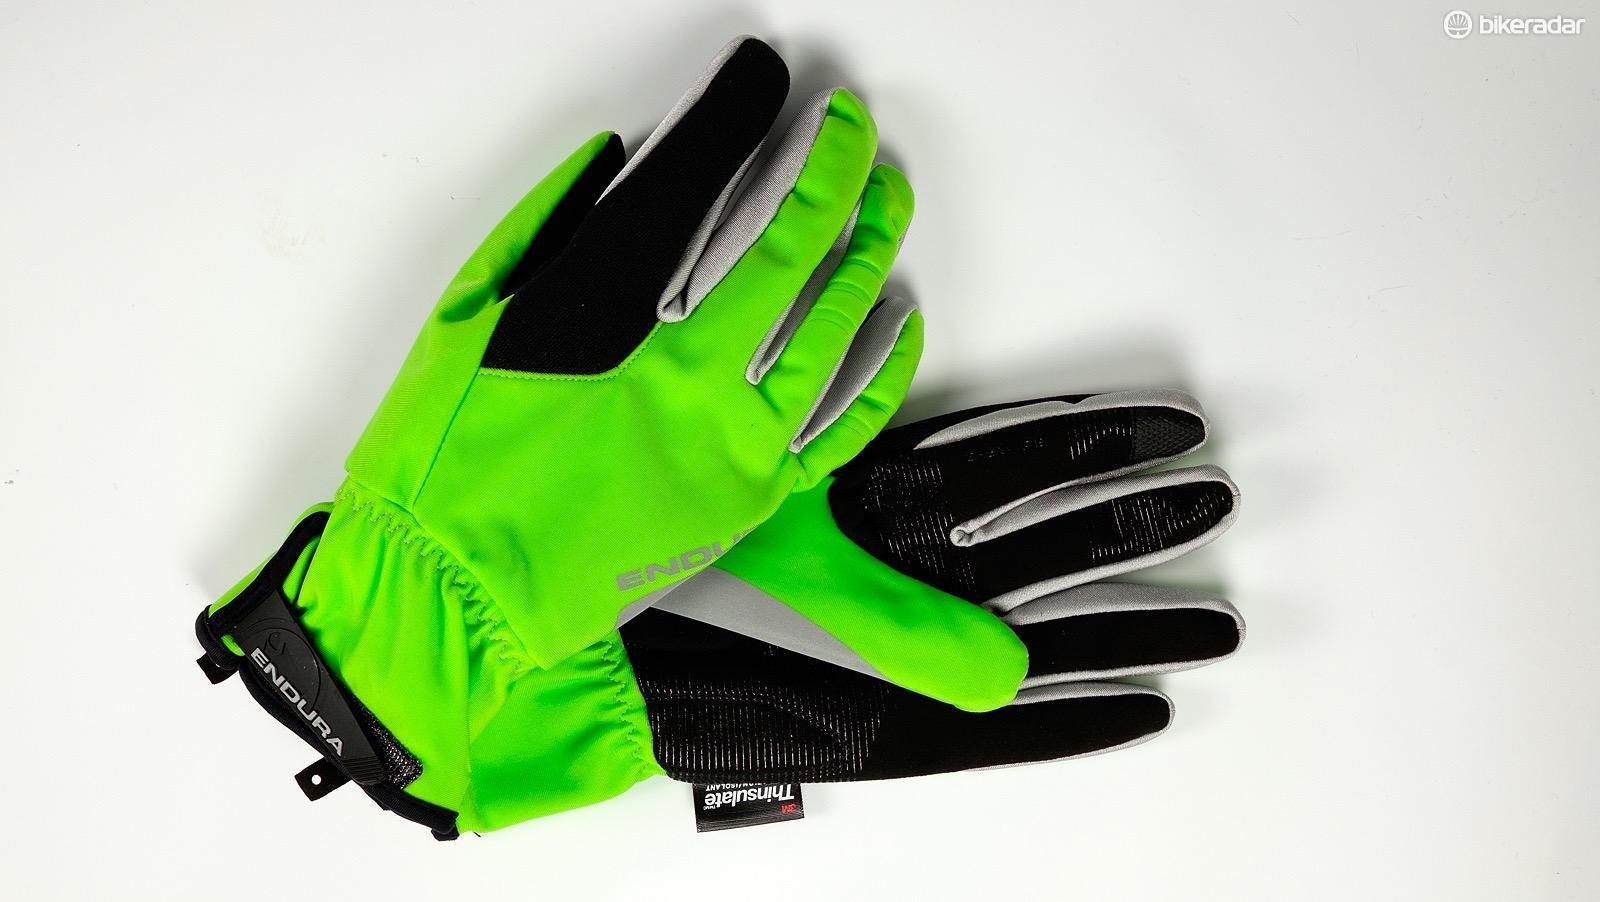 gloves-5-of-6-1510591369545-1dpxj7mhsucdm-7474a4a